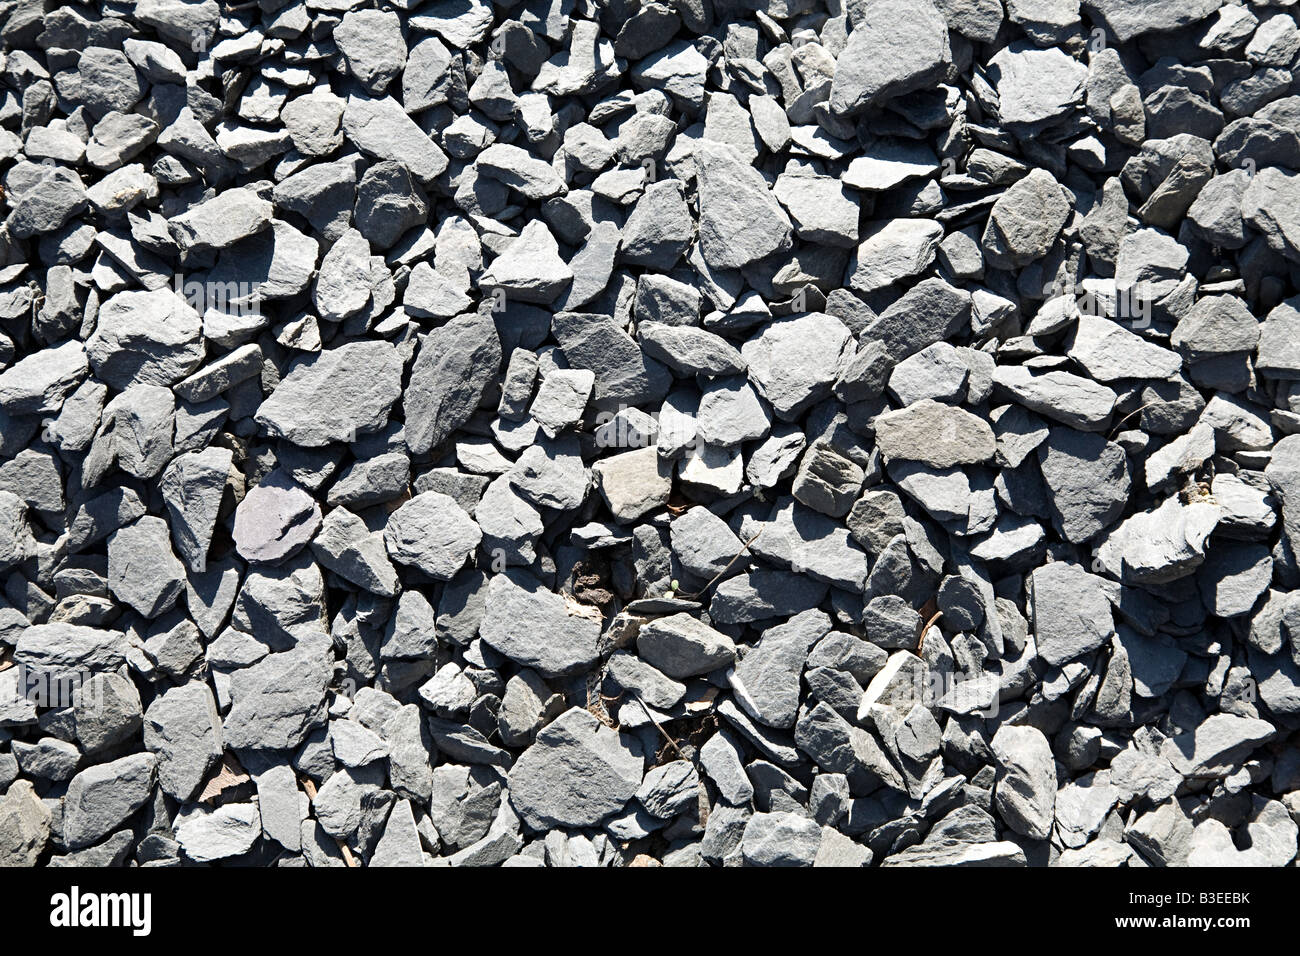 Full frame image of stones - Stock Image